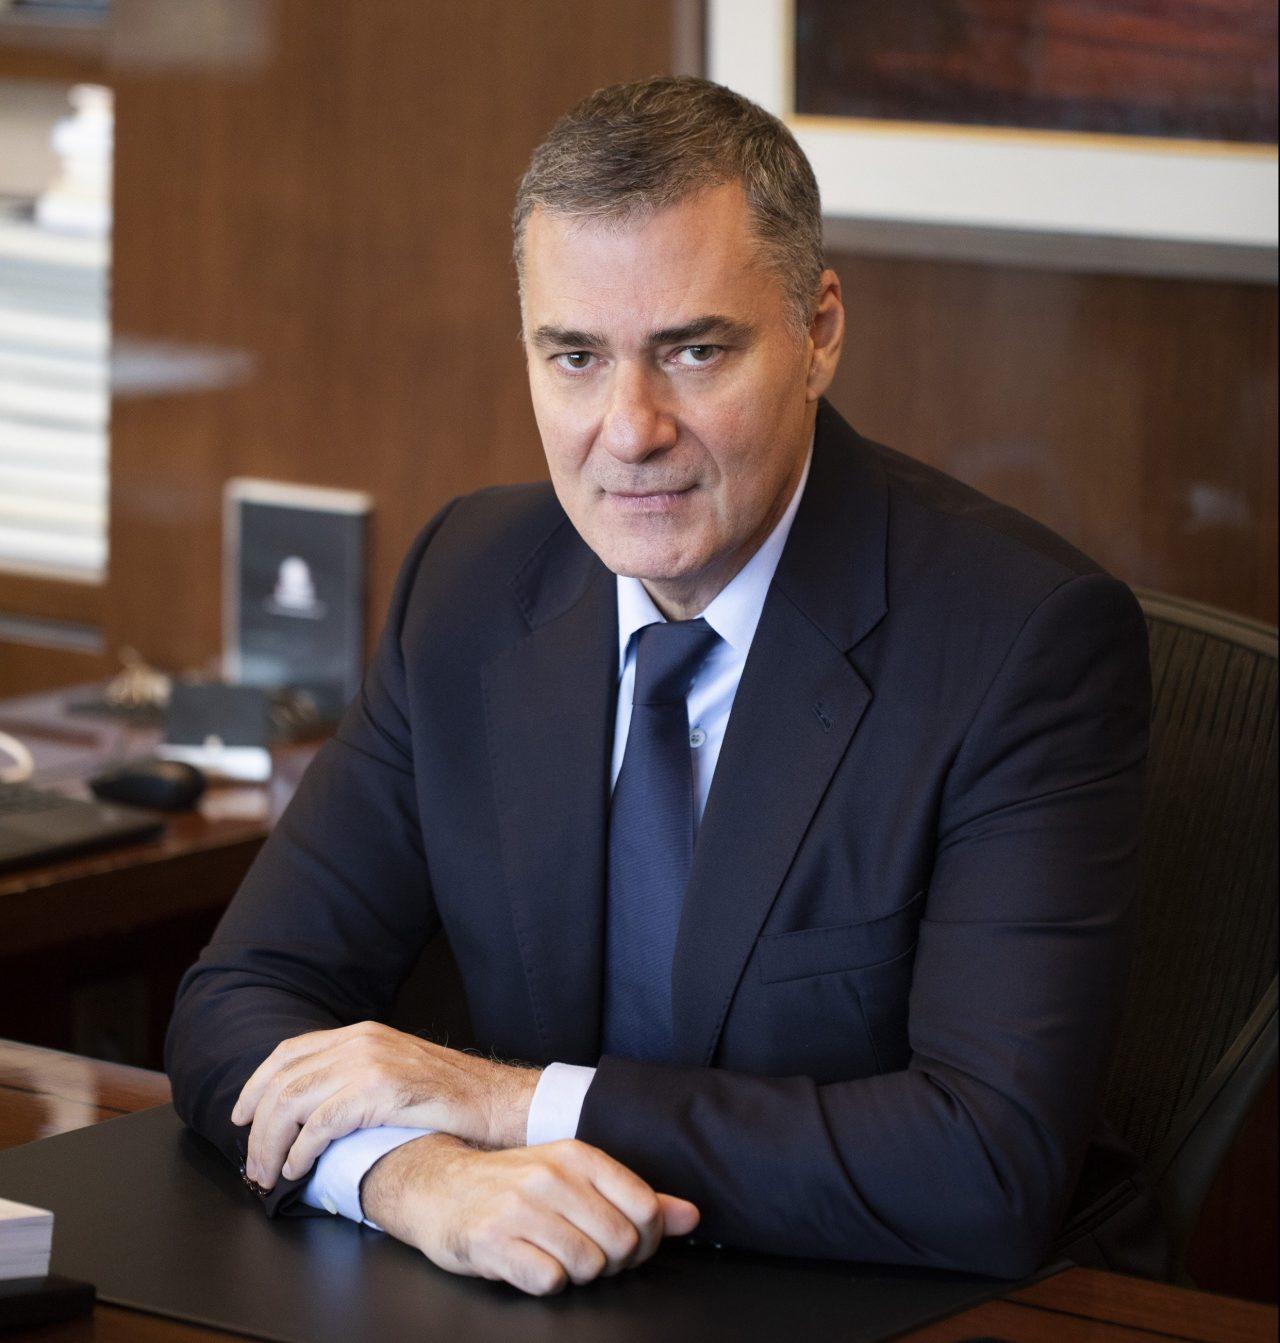 K. Κωνσταντακόπουλος: Το νέο μεγάλο deal της Costamare